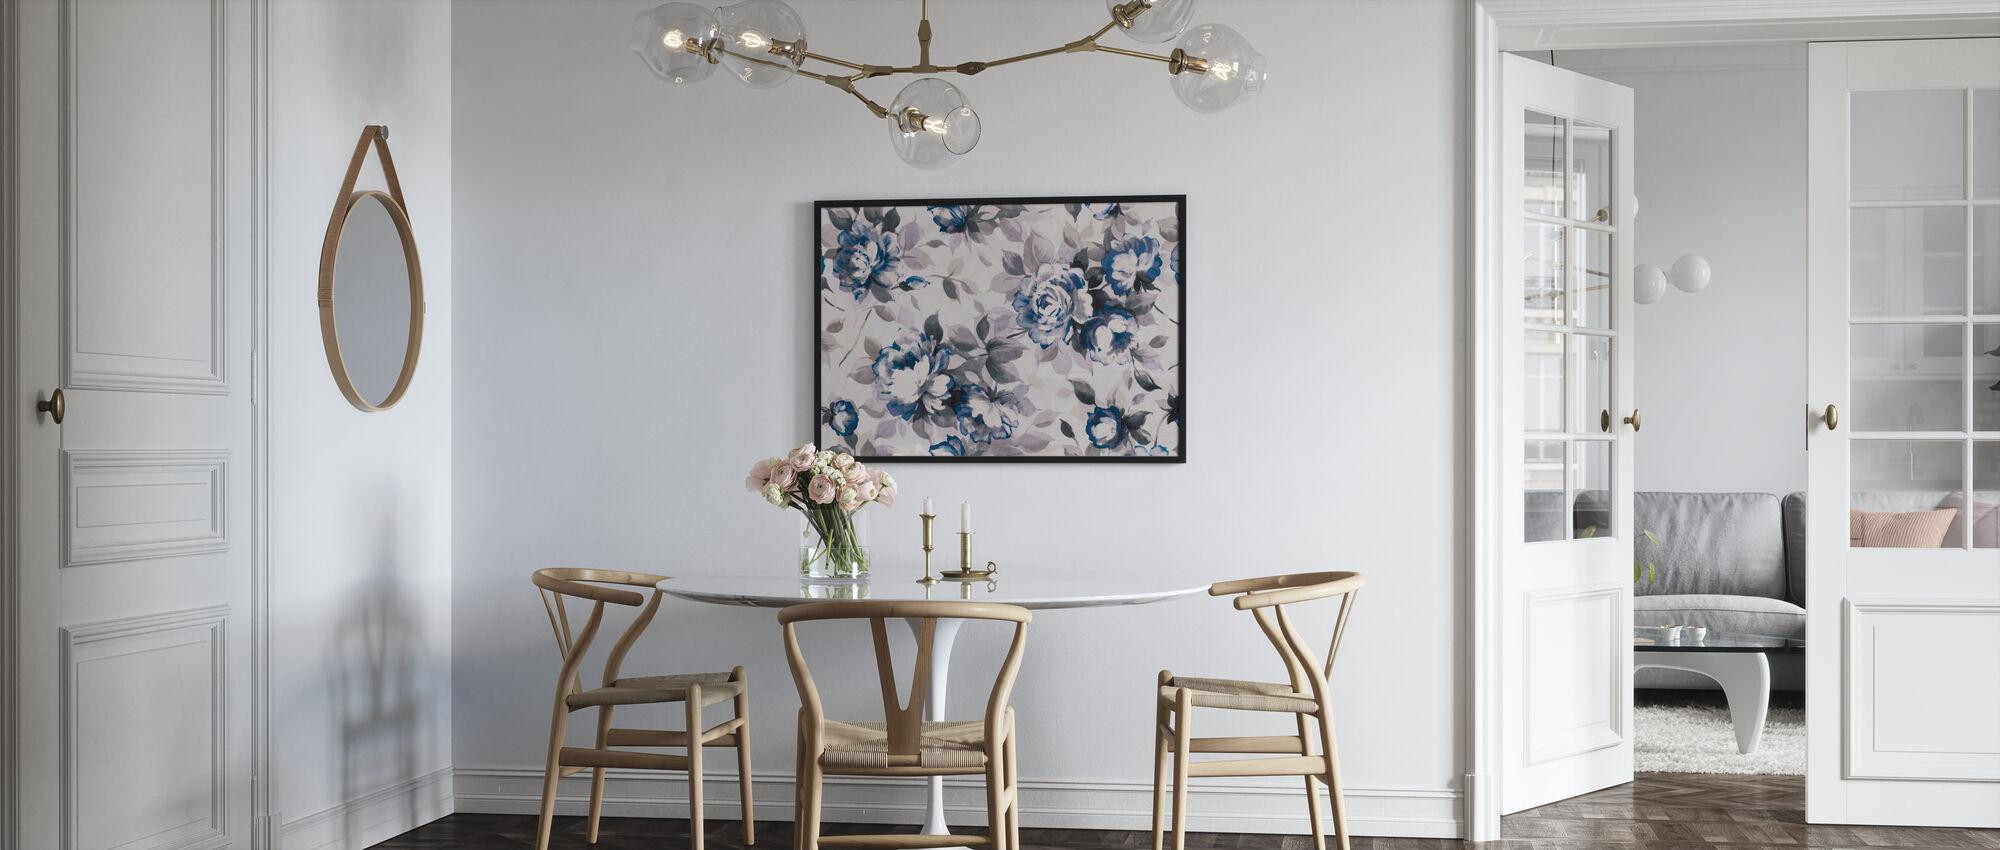 Scent of Roses Indigo - Framed print - Kitchen